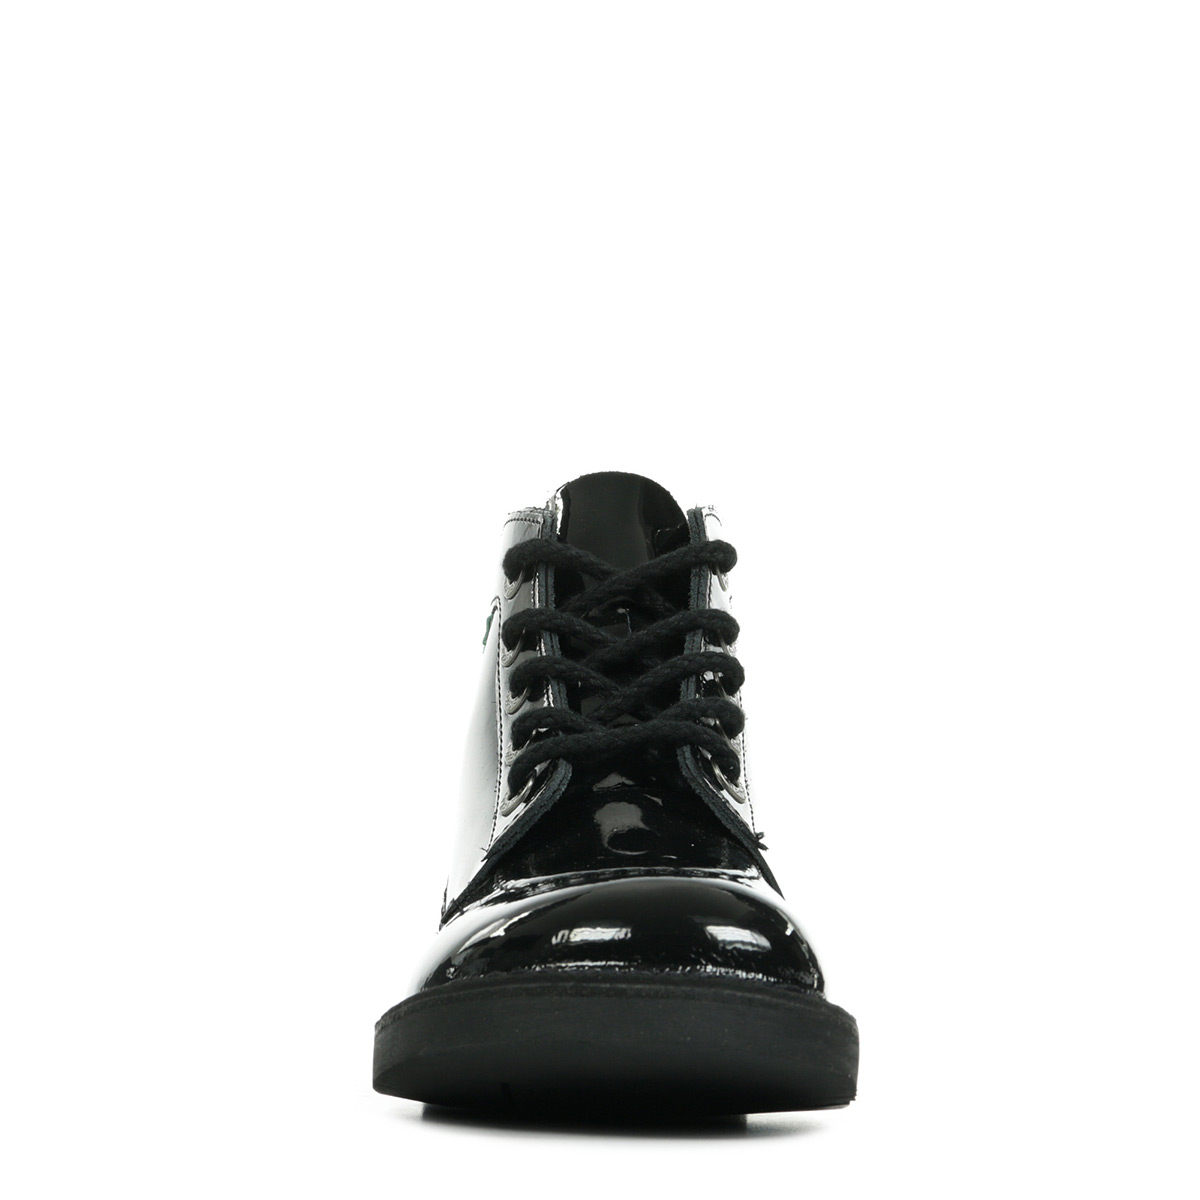 Kickers Kick Col Noir Vernis Perm 2090353083, Bottines femme